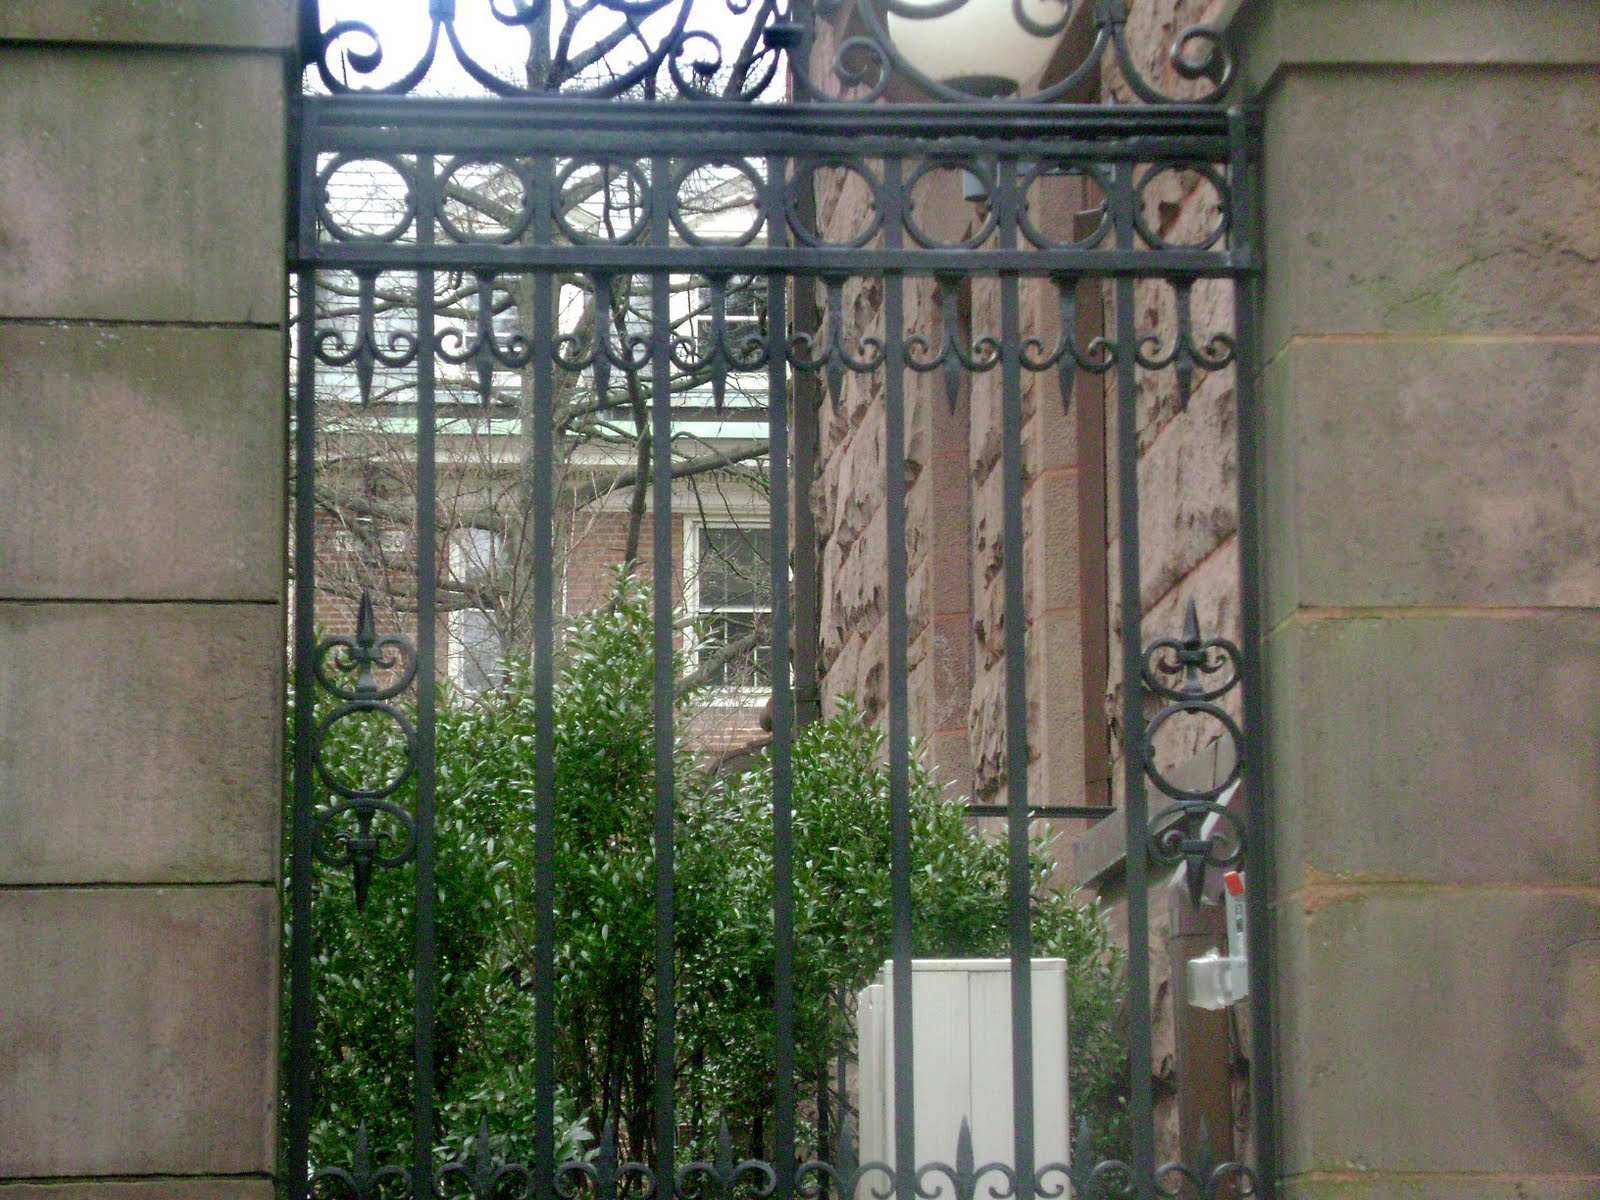 Spring 2010 Digital Photography Yale University Gate